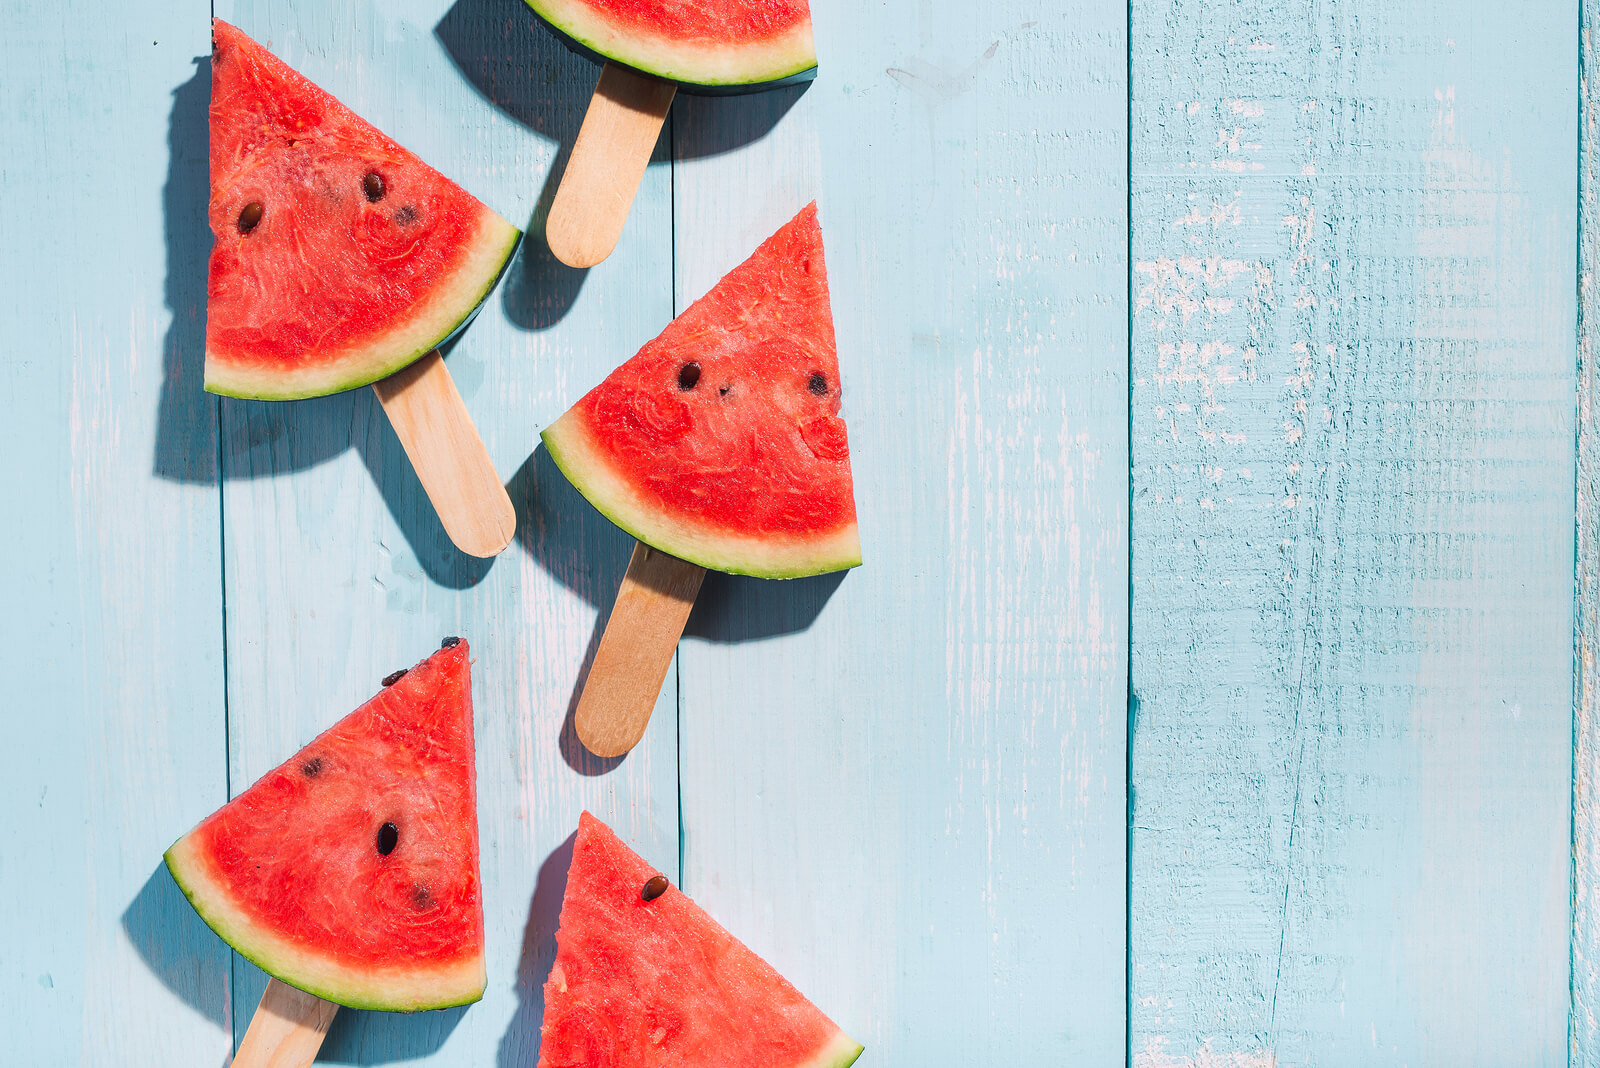 bigstock Slices Of Watermelon On Blue W 242057263